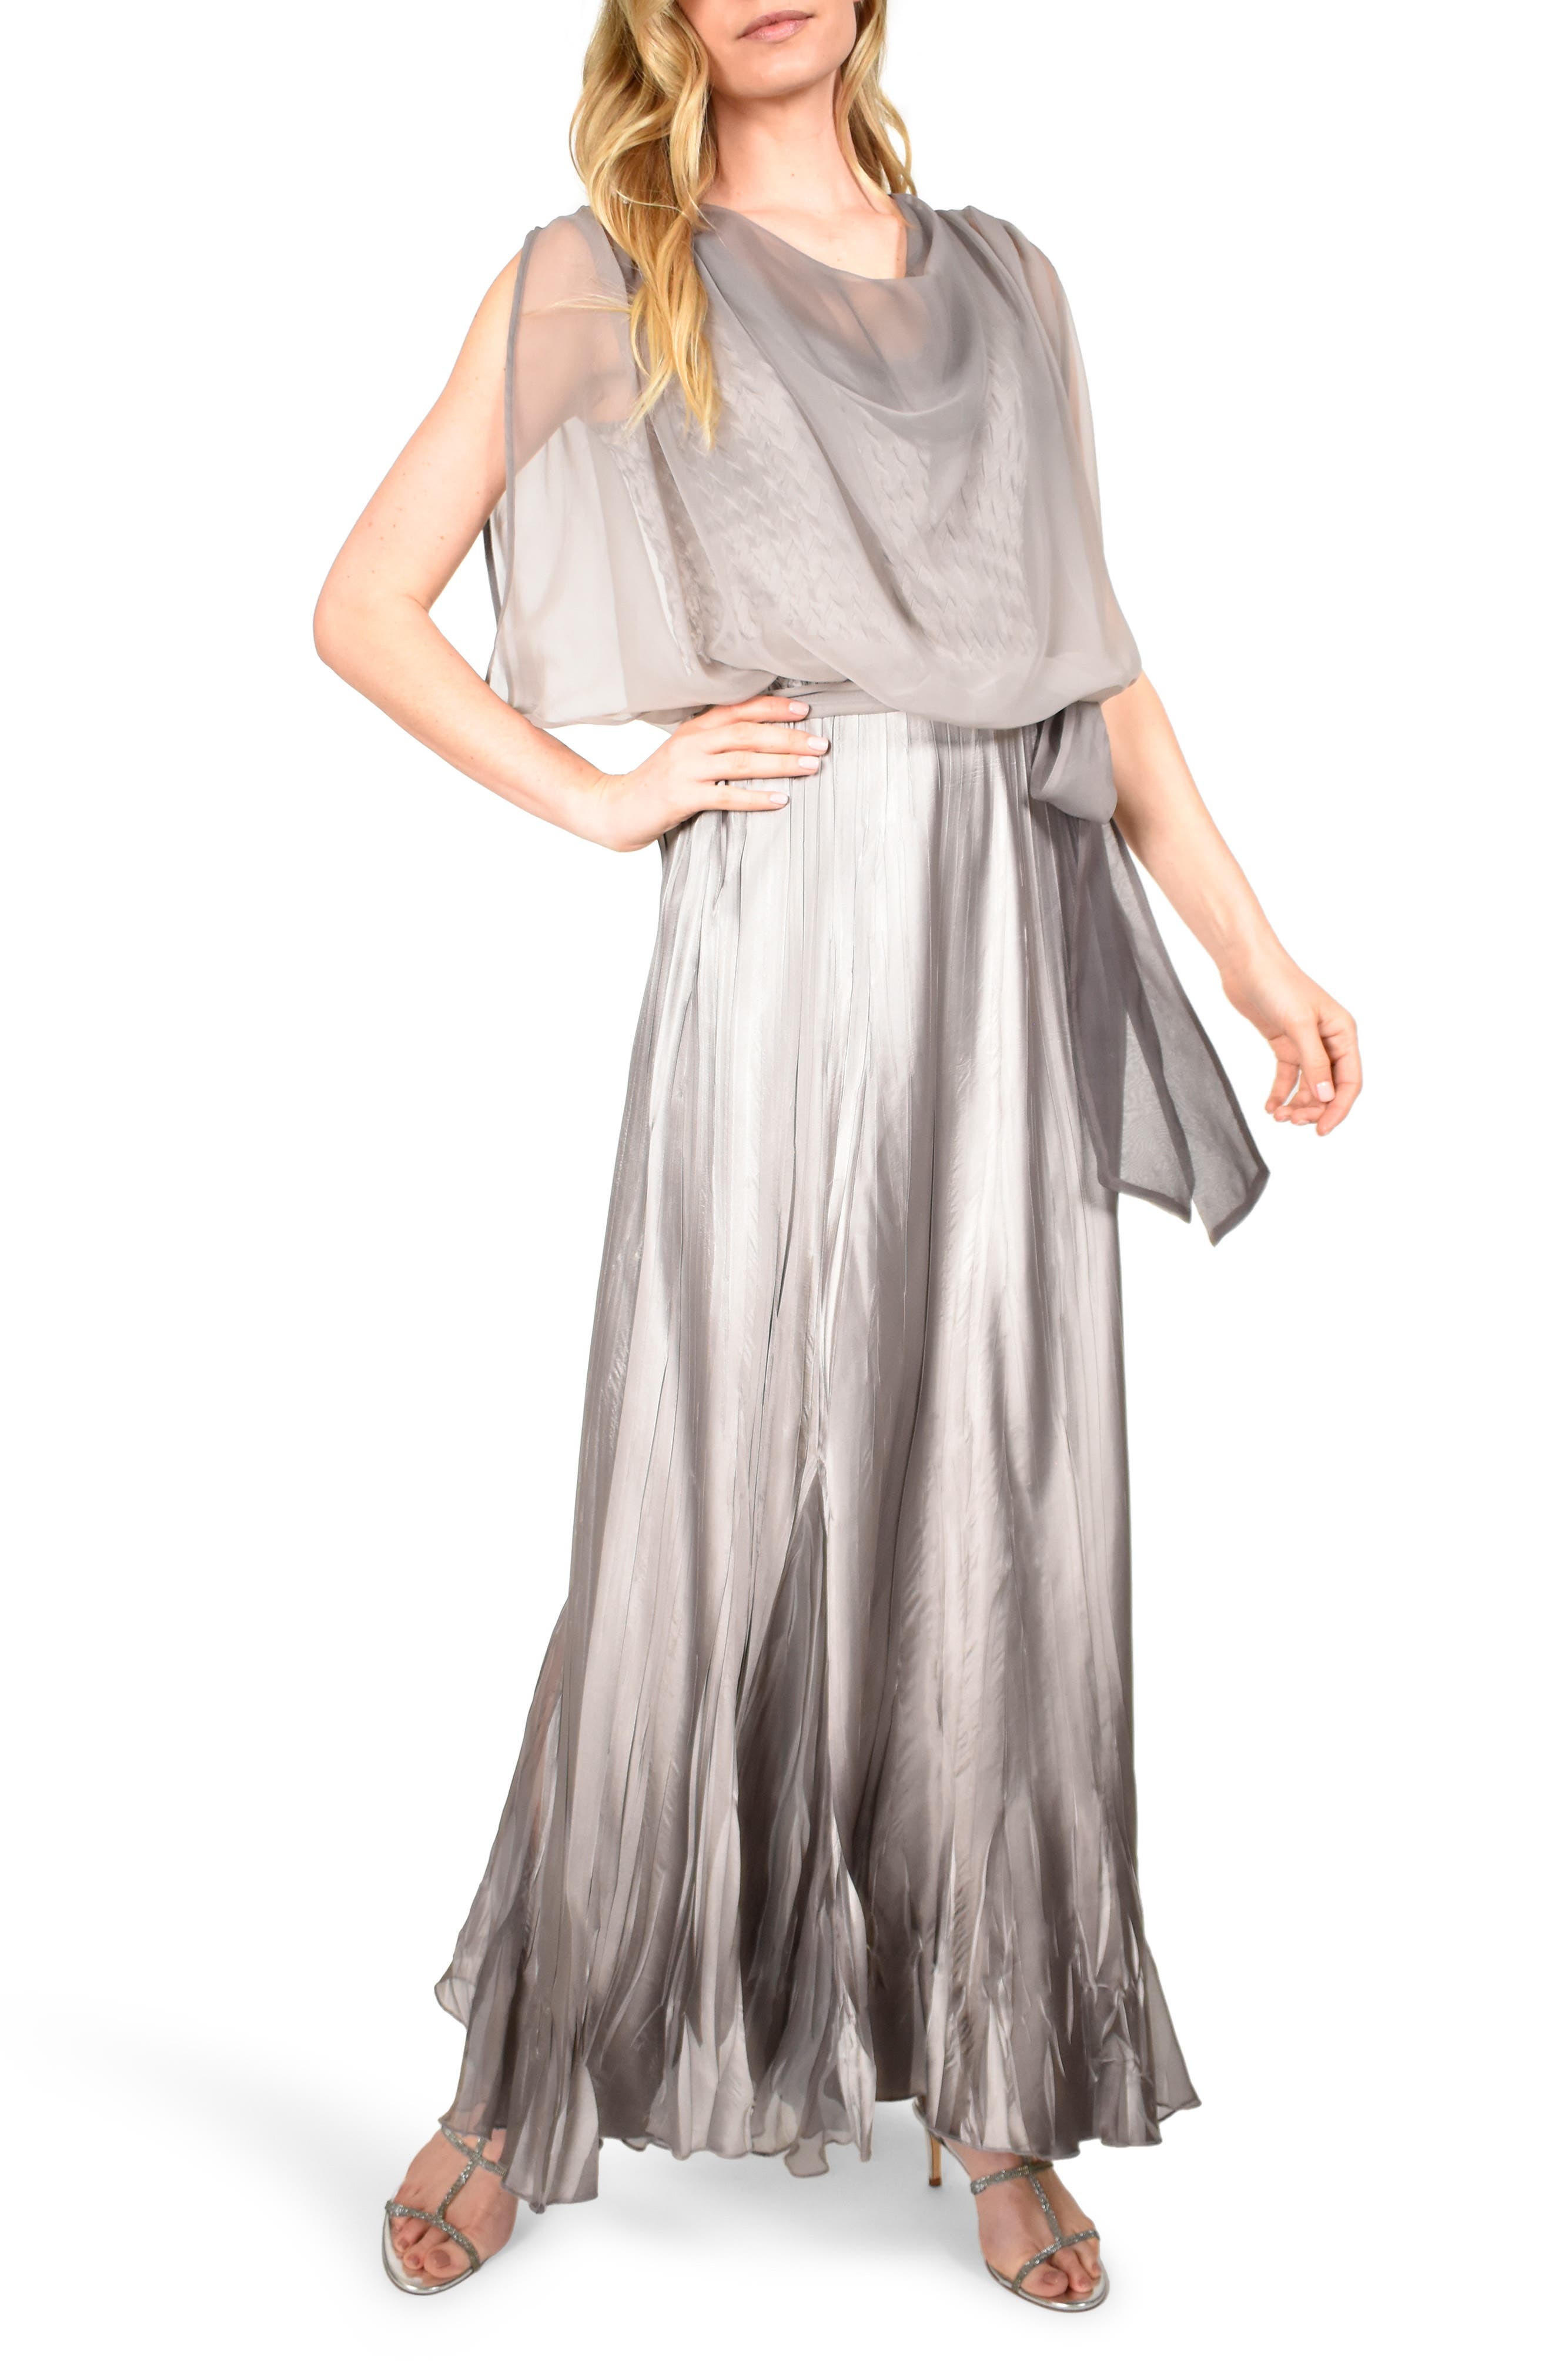 Titanic Dresses & Costumes   1912 Dresses Womens Komarov Cowl Neck Popover Gown $428.00 AT vintagedancer.com